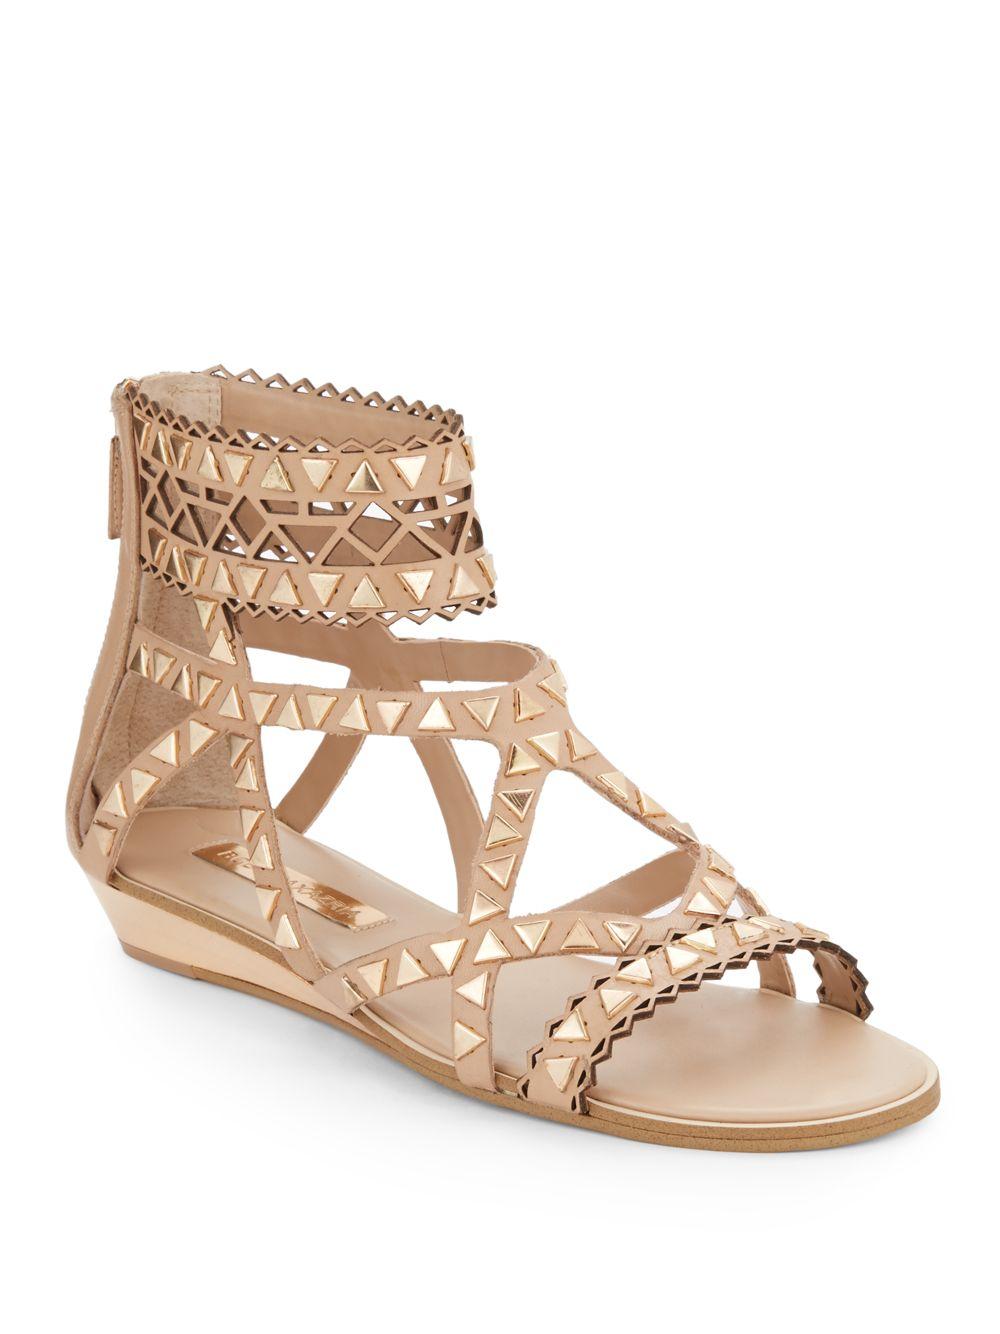 Bcbgmaxazria Brianna Embellished Low Wedge Leather Sandals